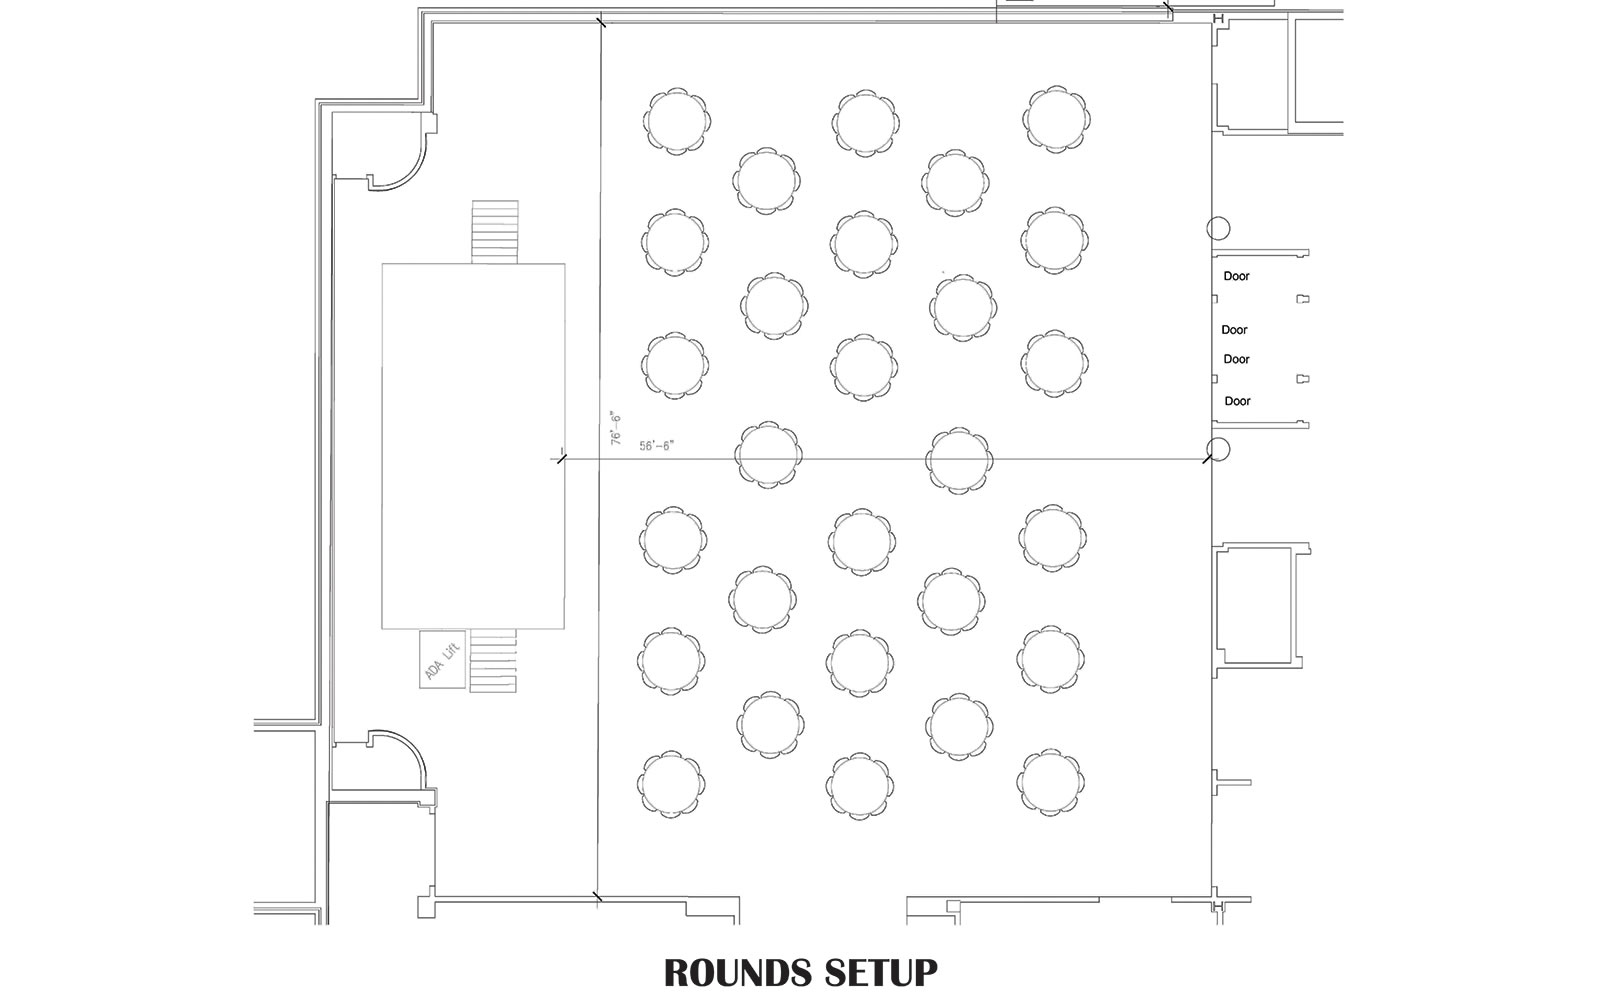 Rounds Setup